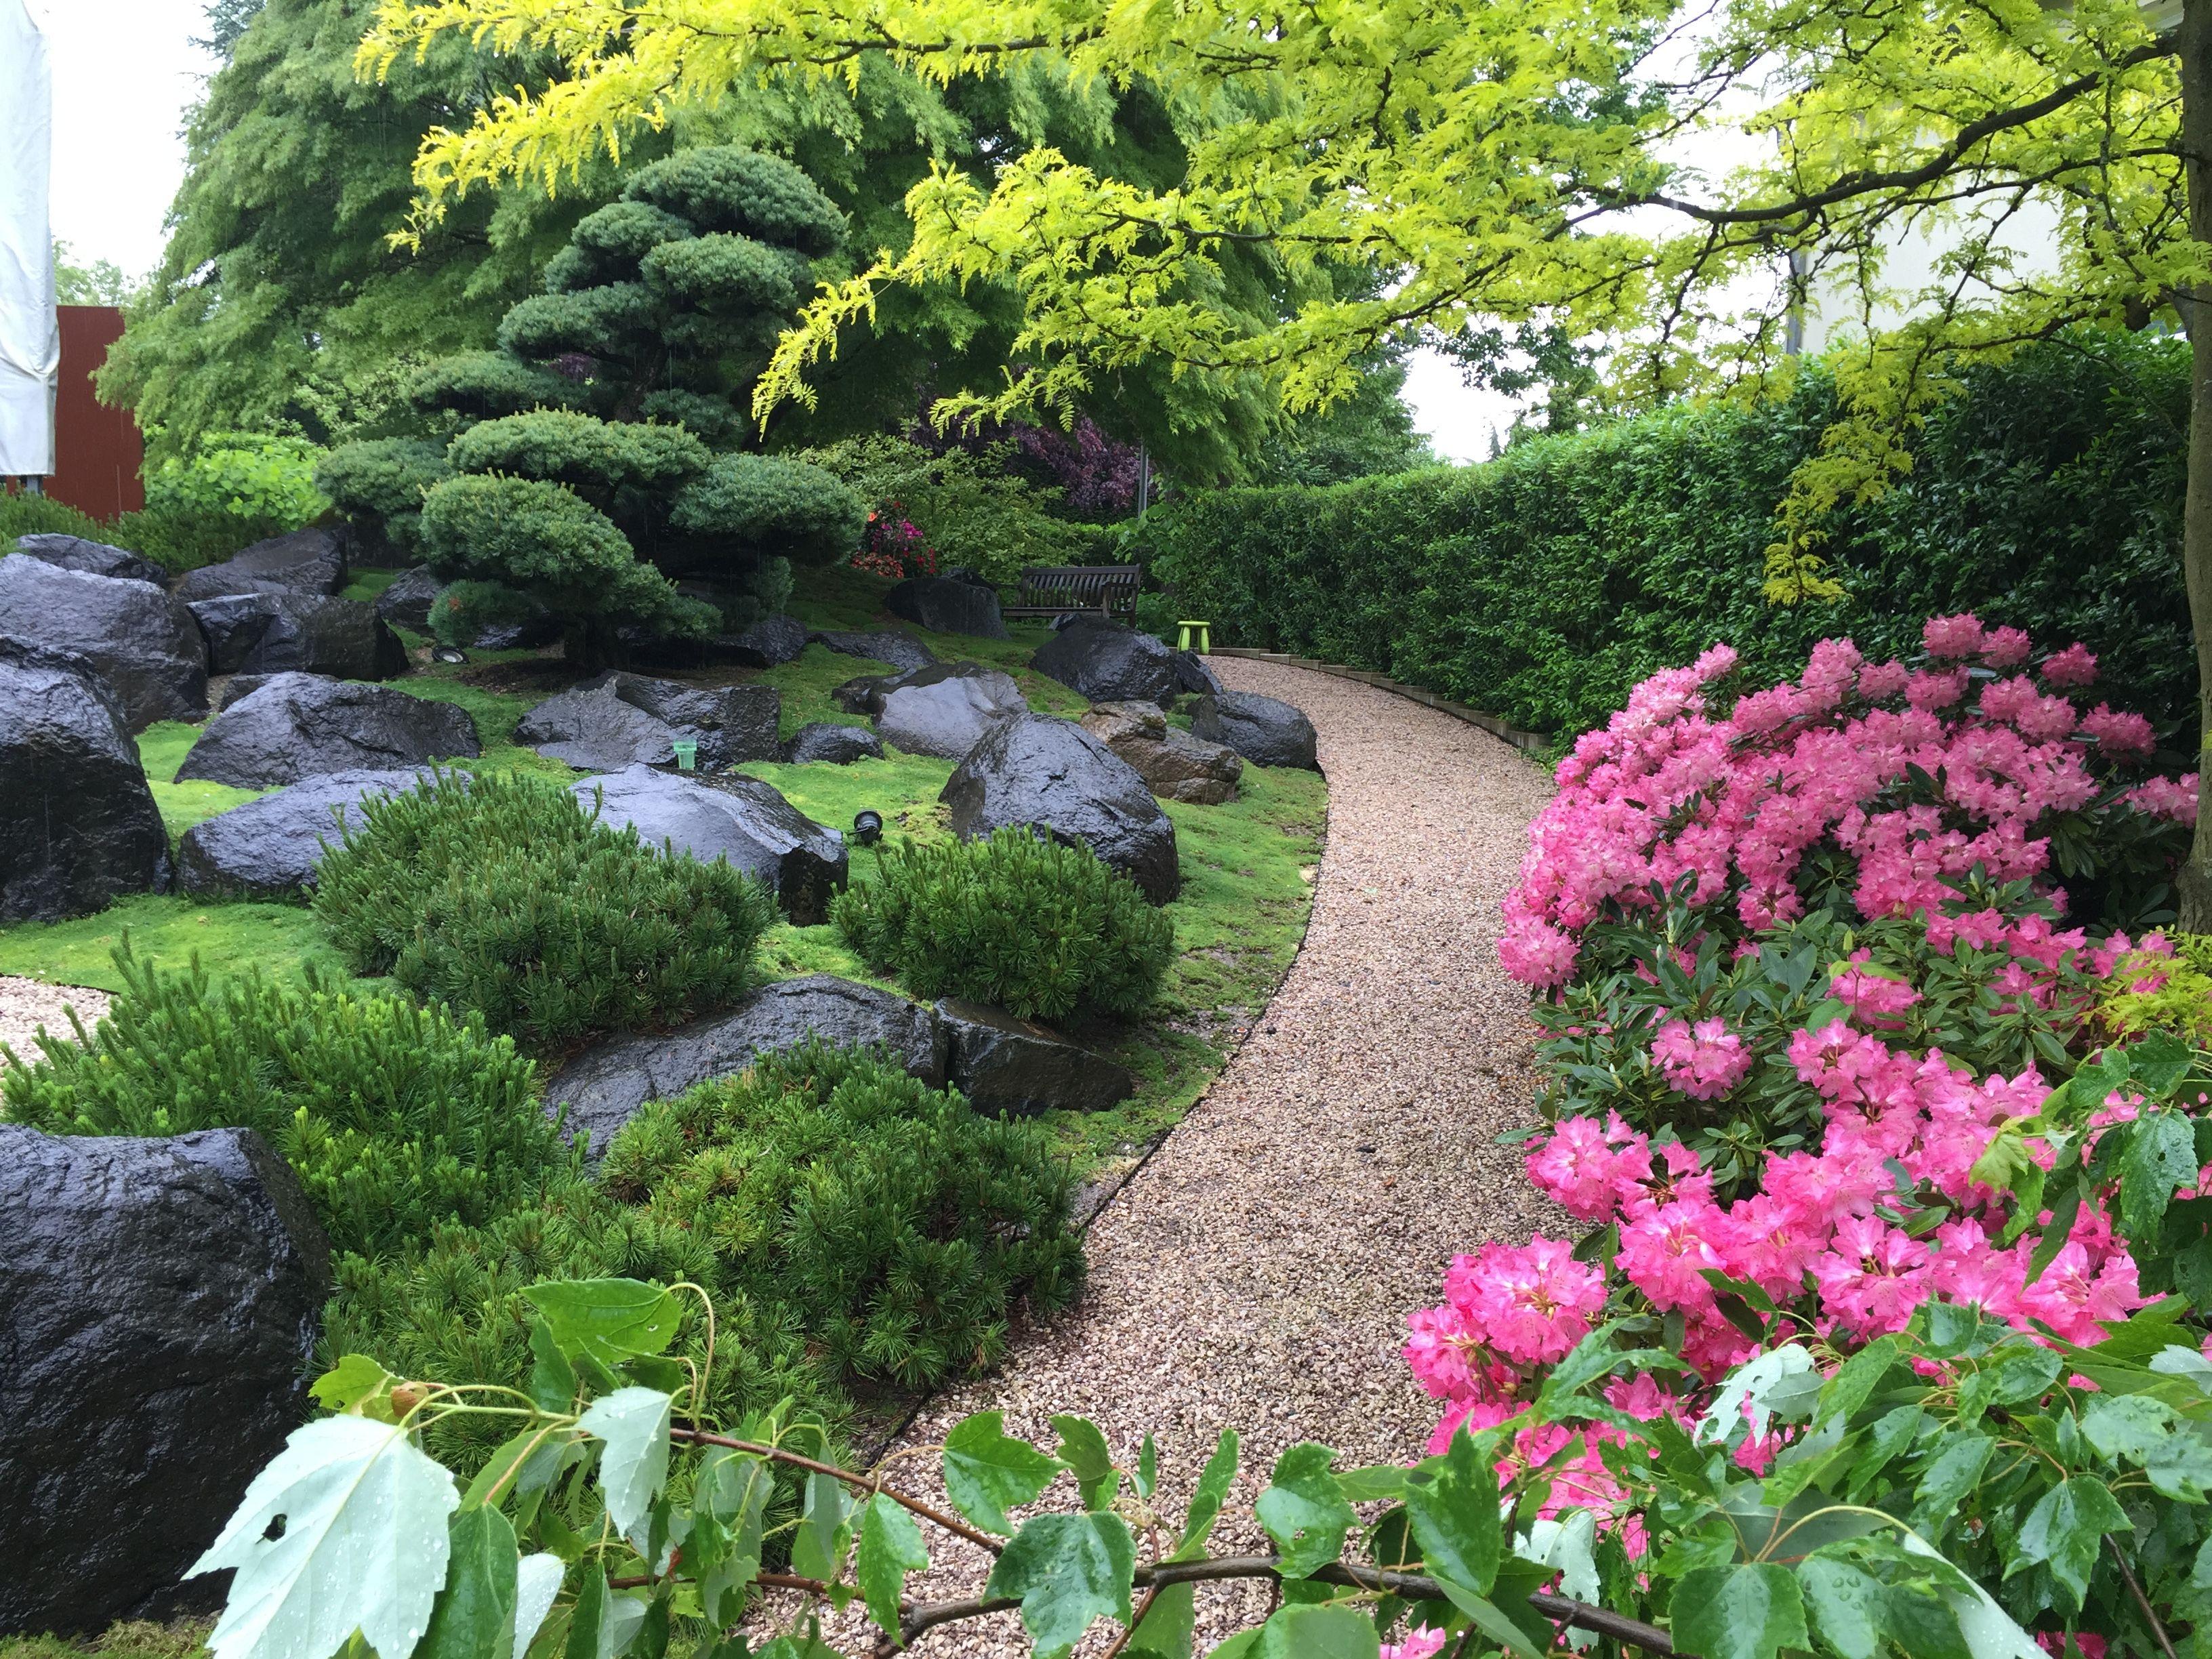 sommerstimmung im asiatischen stil rhododendron kissenf rmige kiefern und findlinge entlang. Black Bedroom Furniture Sets. Home Design Ideas